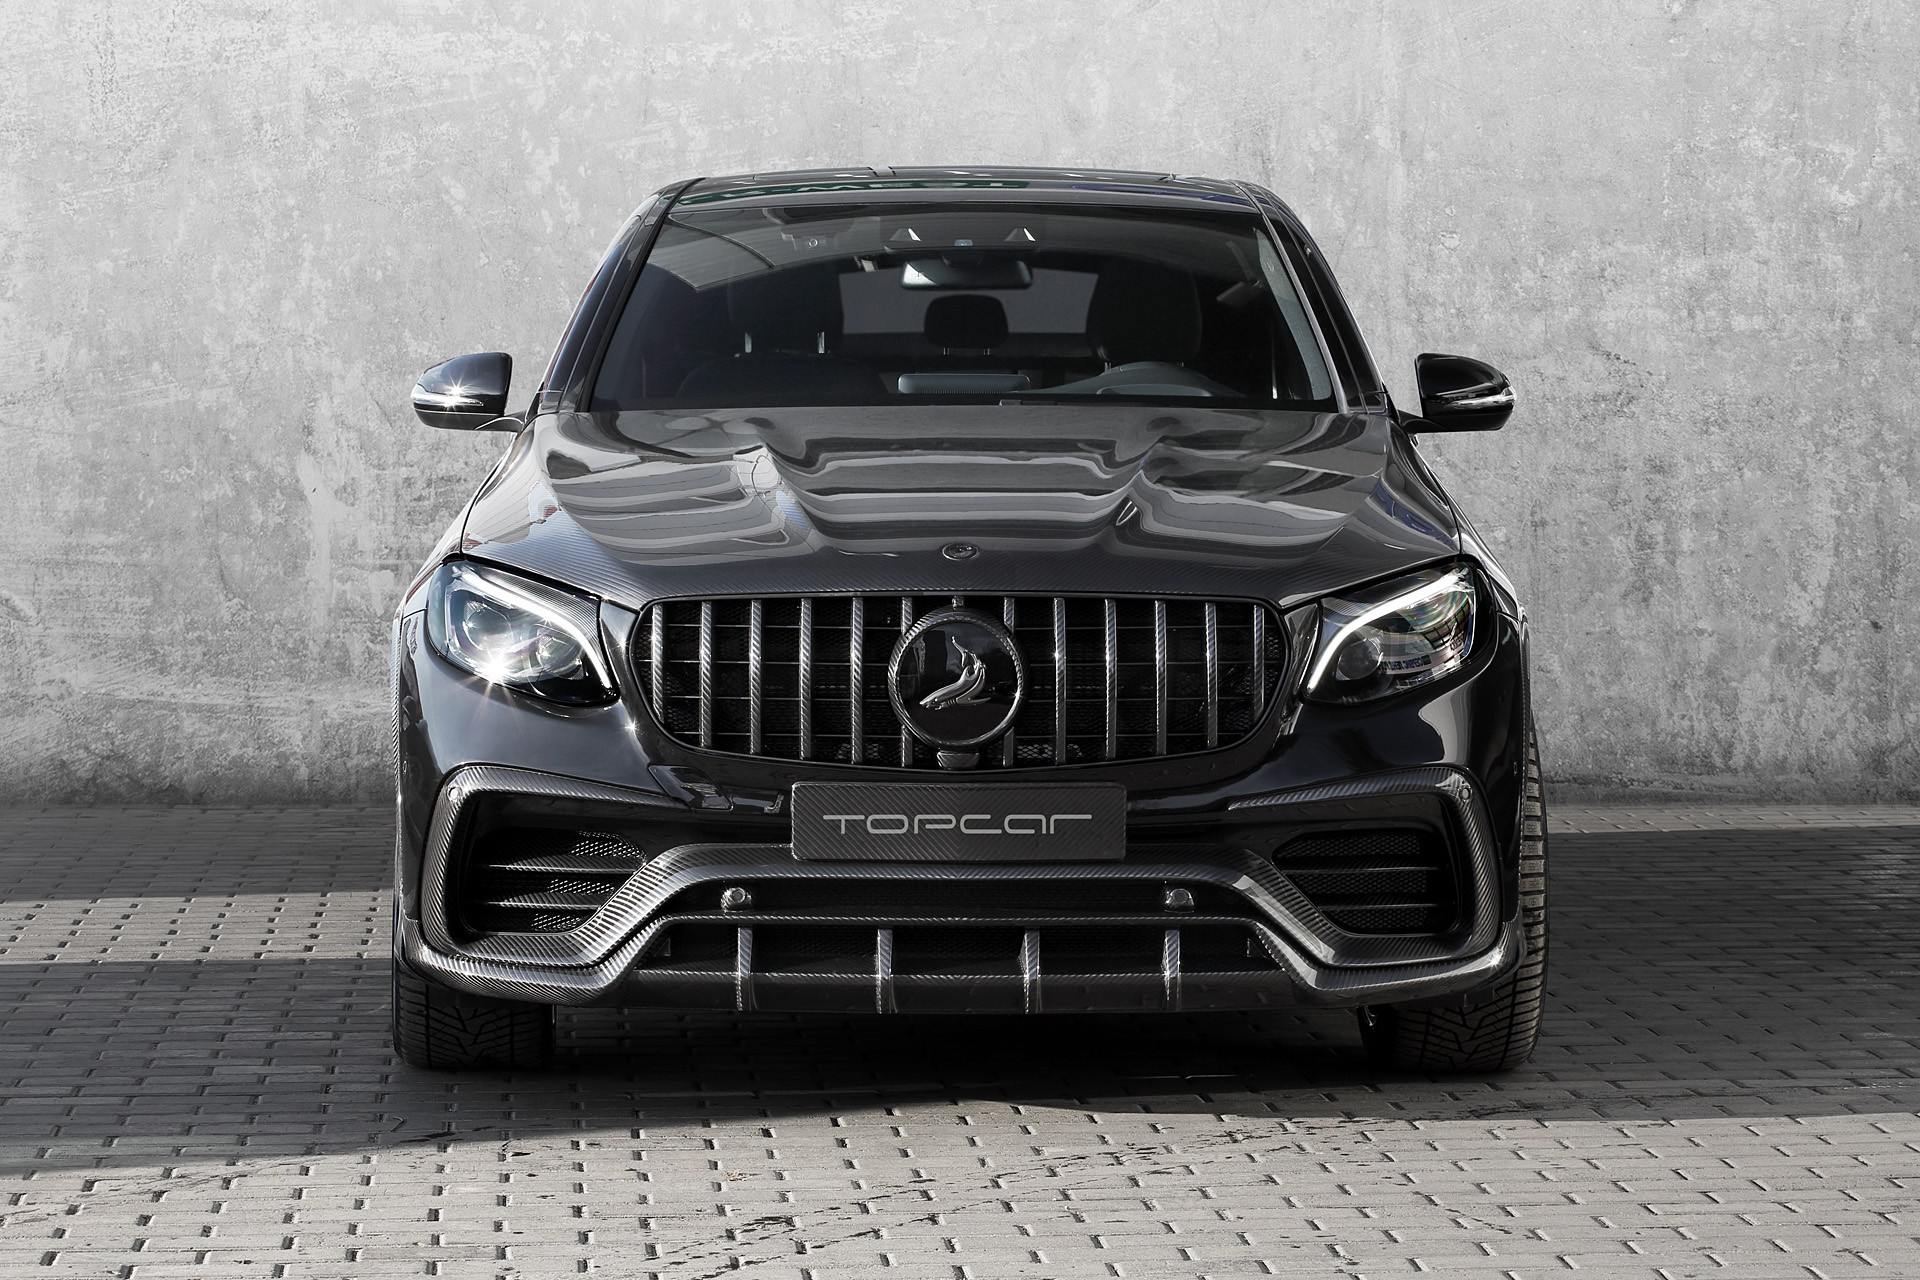 Mercedes Amg Glc Coupe 63s Inferno Topcar